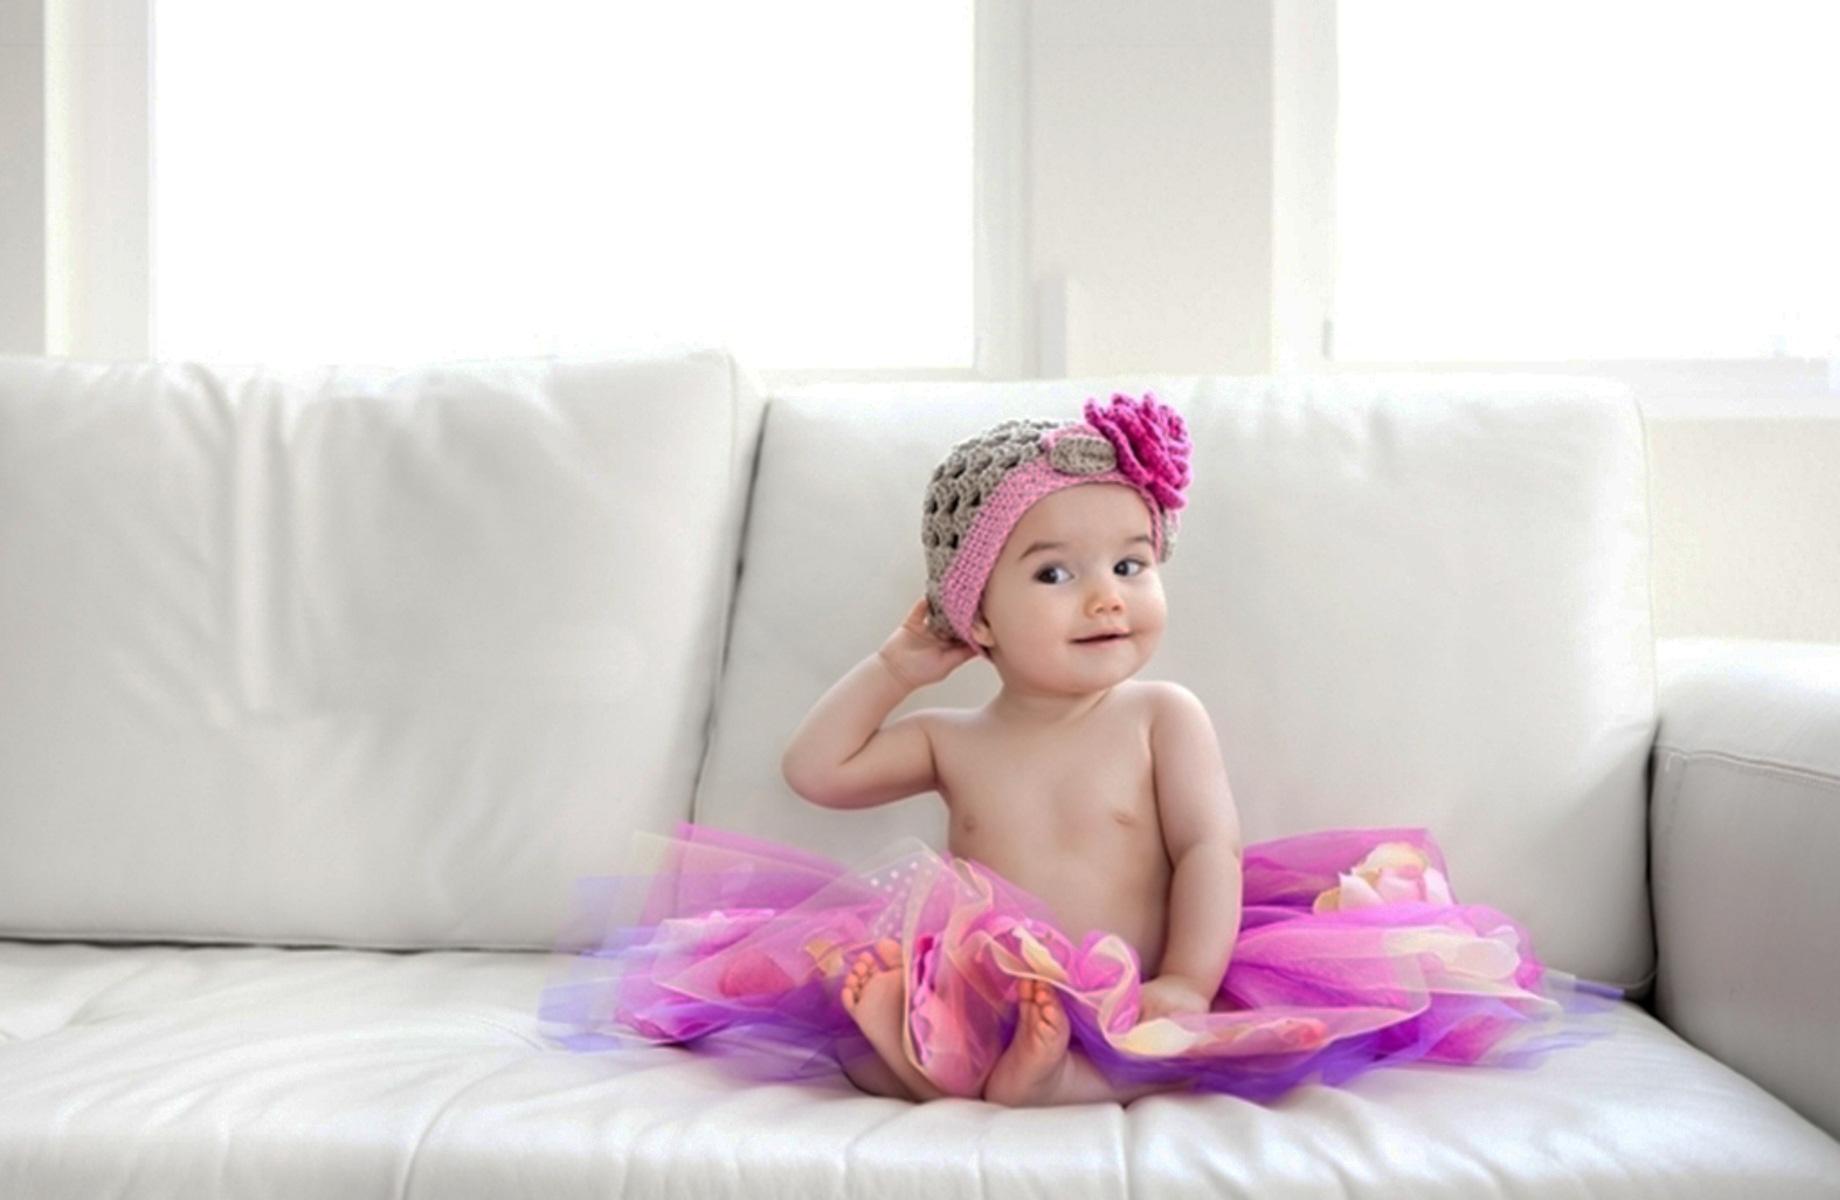 Wallpaper download baby girl - Baby Girl Hd Wallpapers Hd Wallpapers